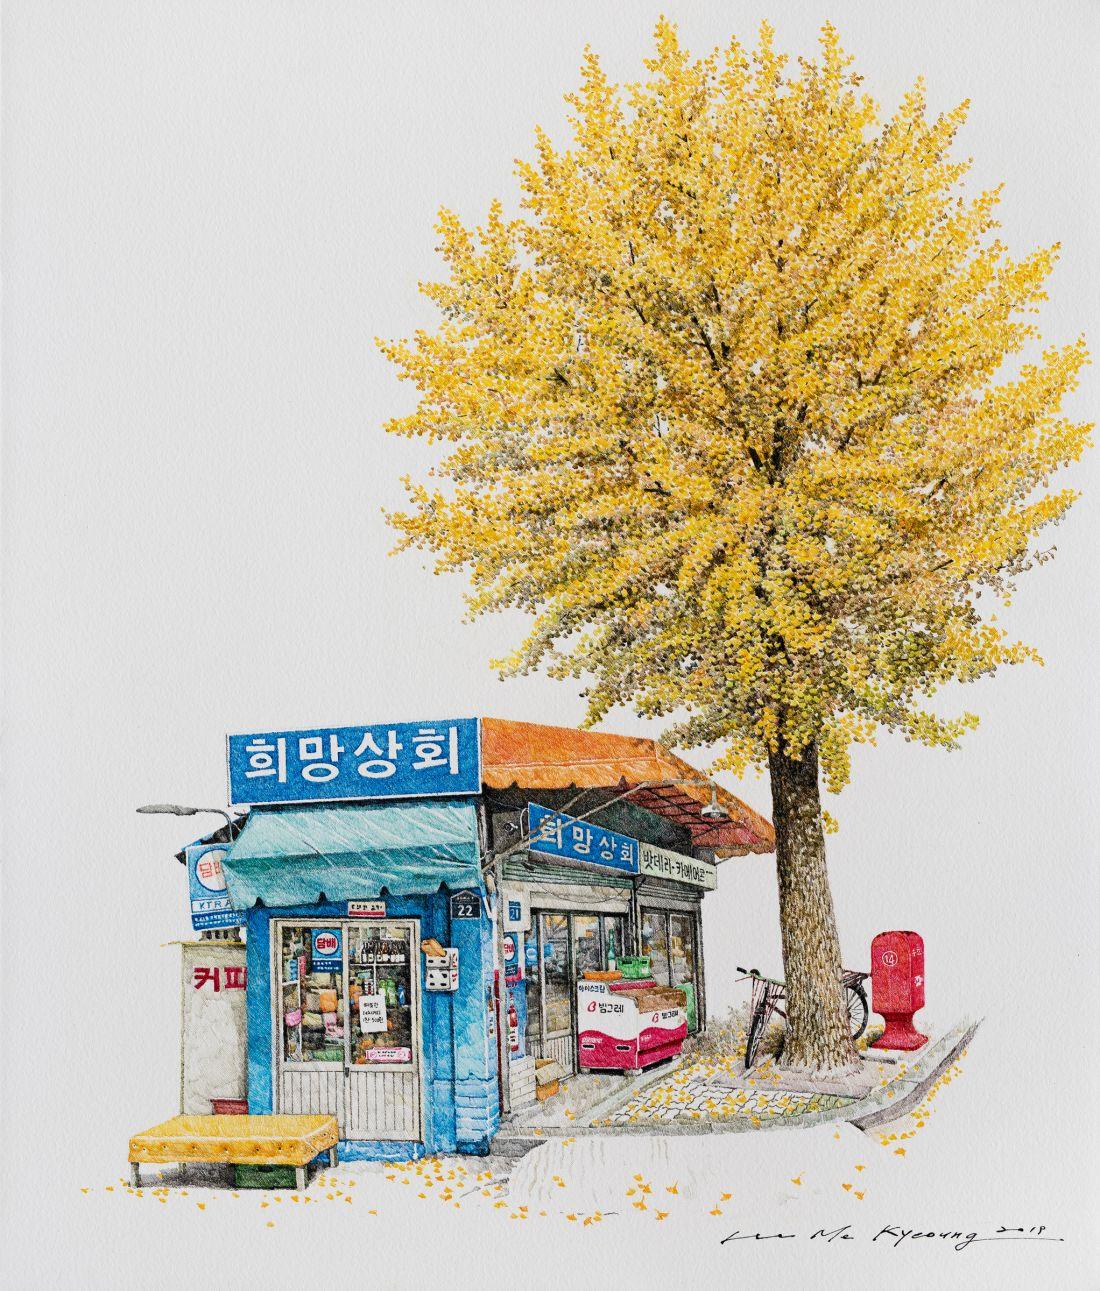 Toko Heemang, 2019 © Me Kyeoung Lee